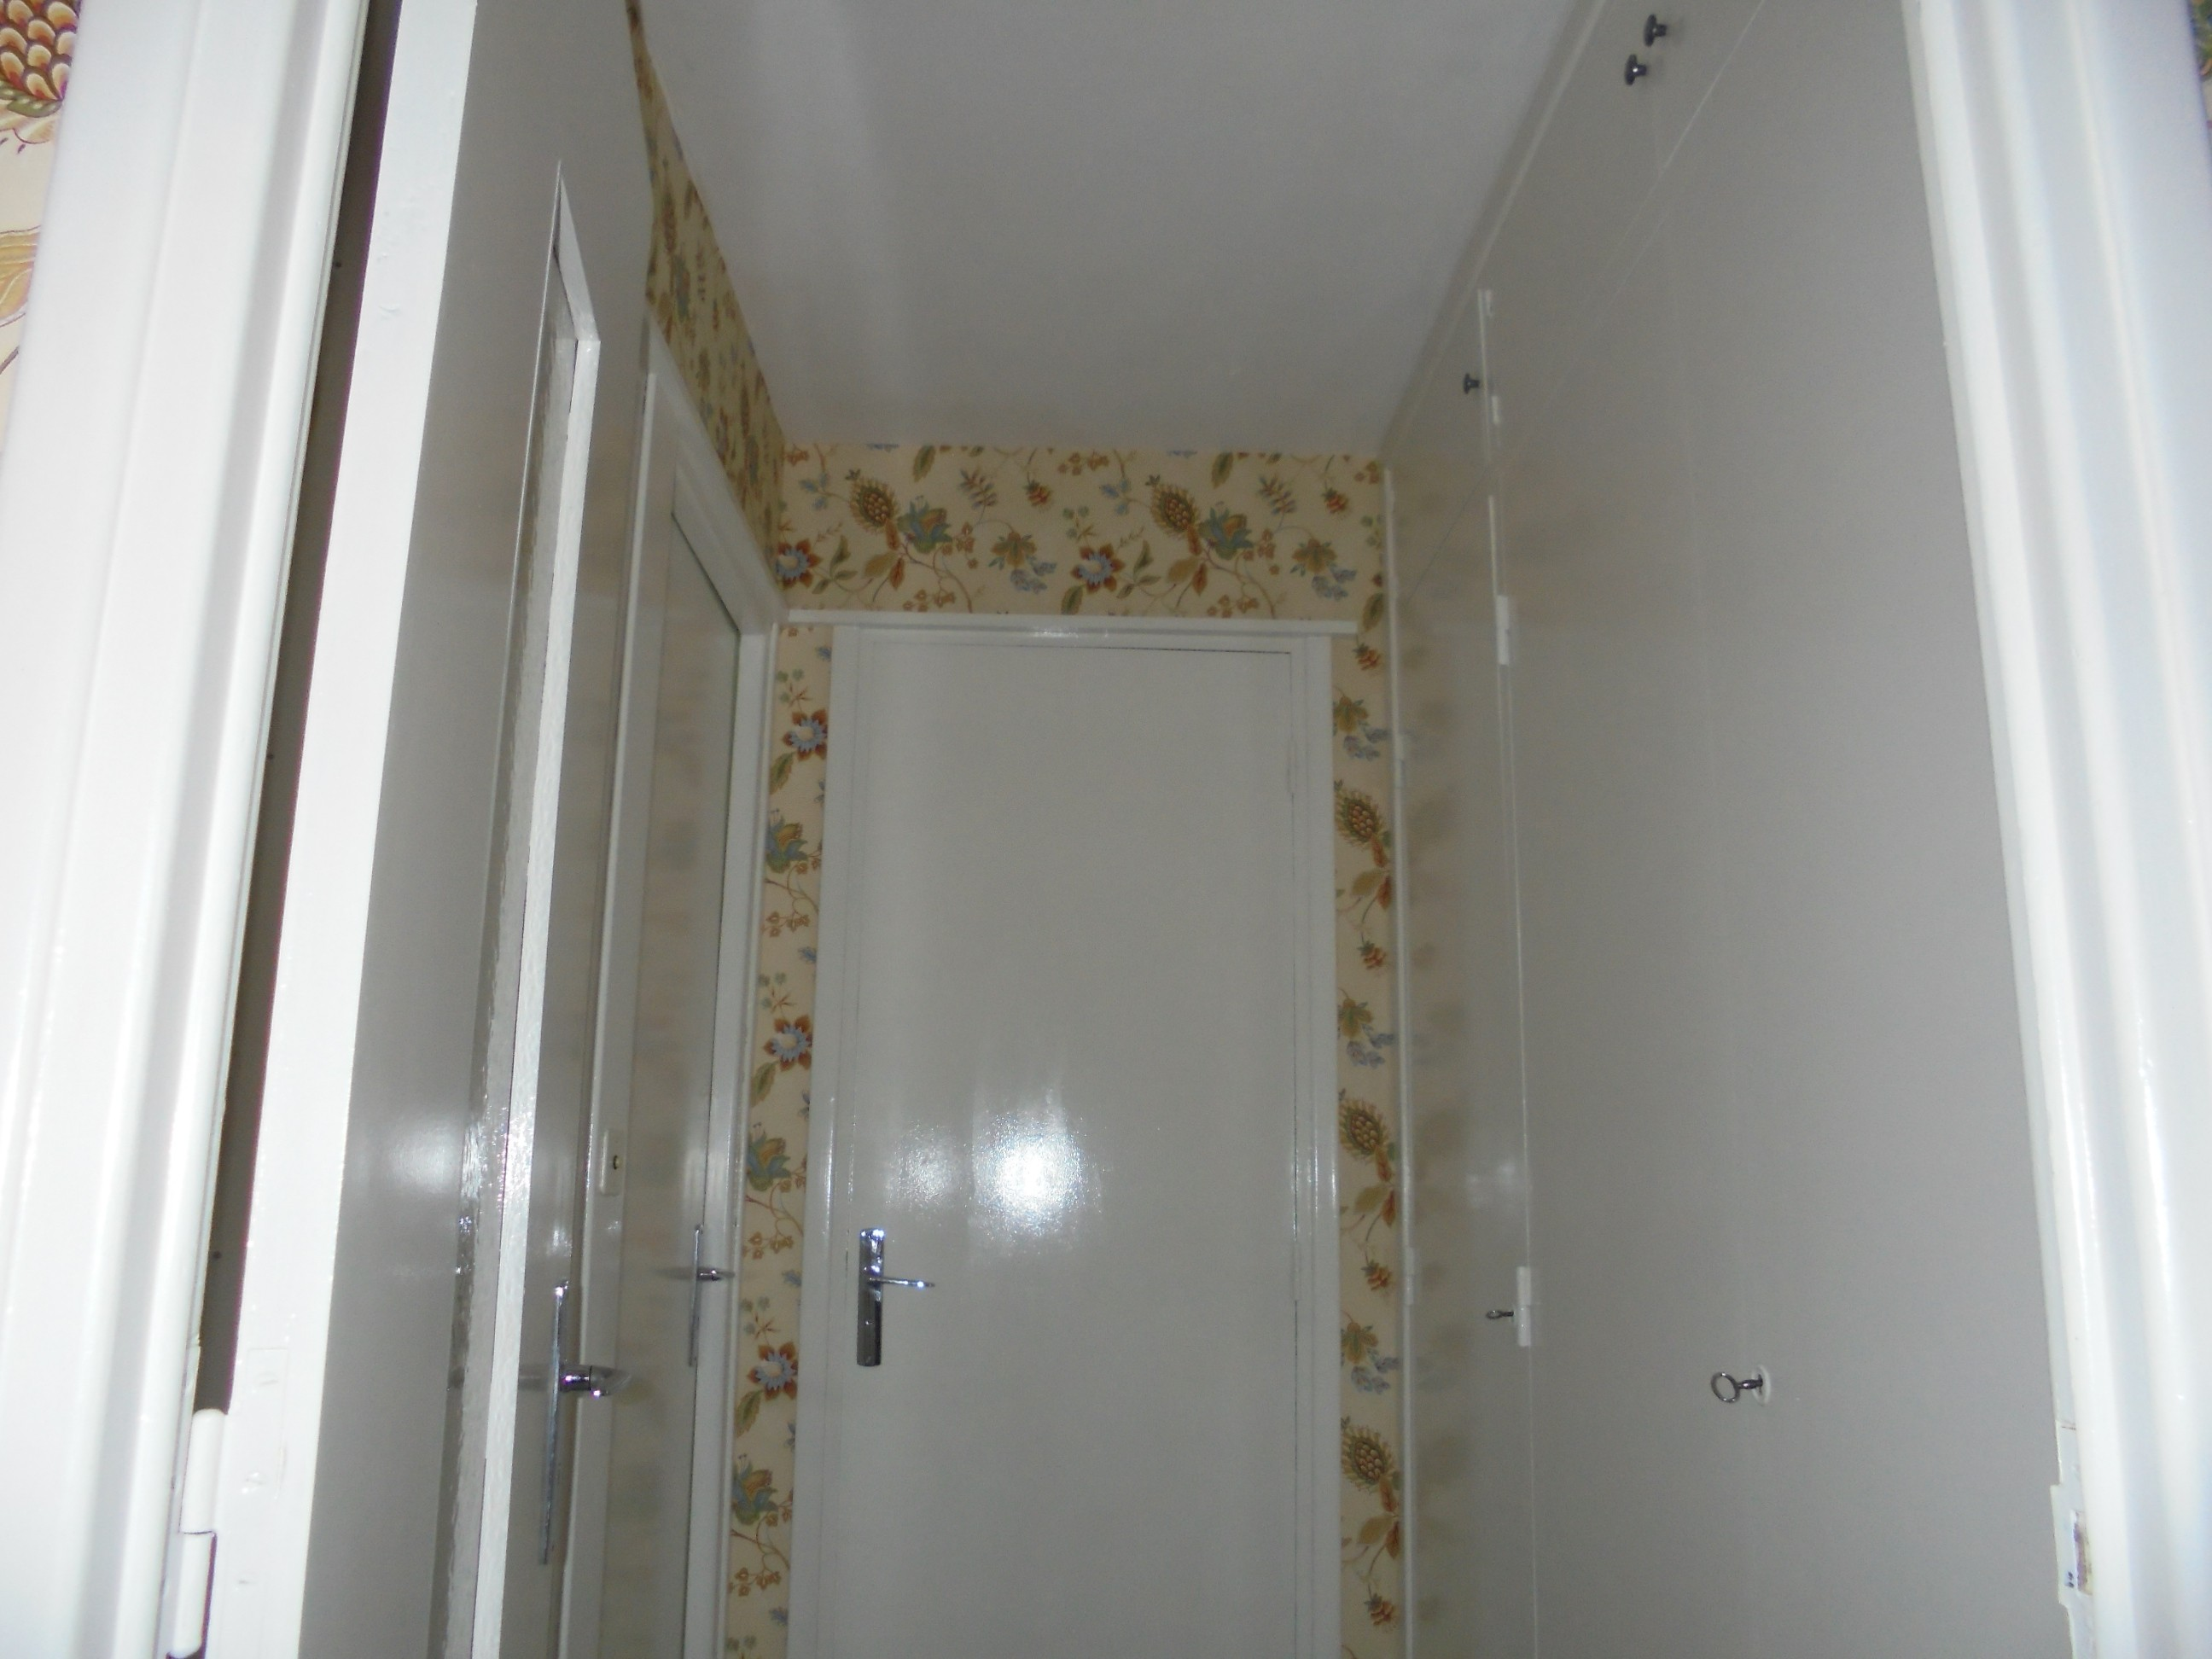 Peindre sur tapisserie chambre tapisserie deco decoration for Repeindre sur une tapisserie